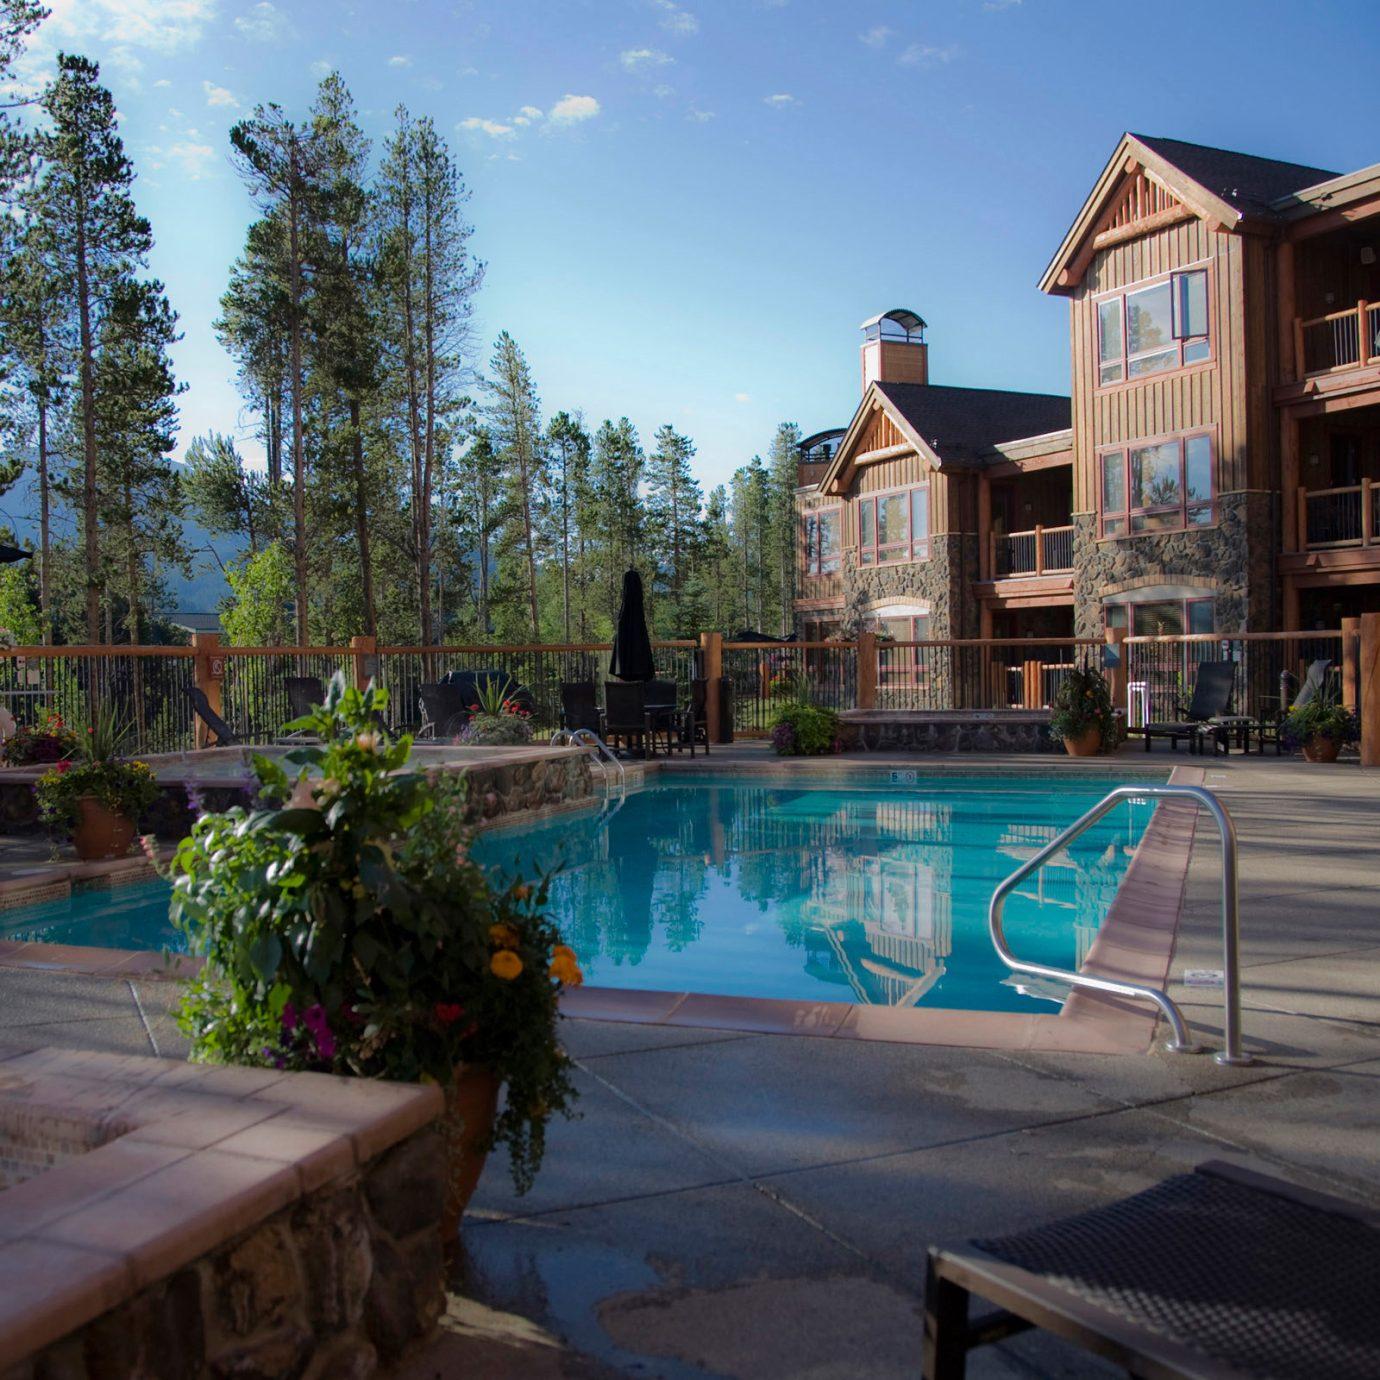 Grounds Lodge Outdoor Activities Pool Romantic Ski tree Town swimming pool Resort home plaza backyard Village walkway waterway